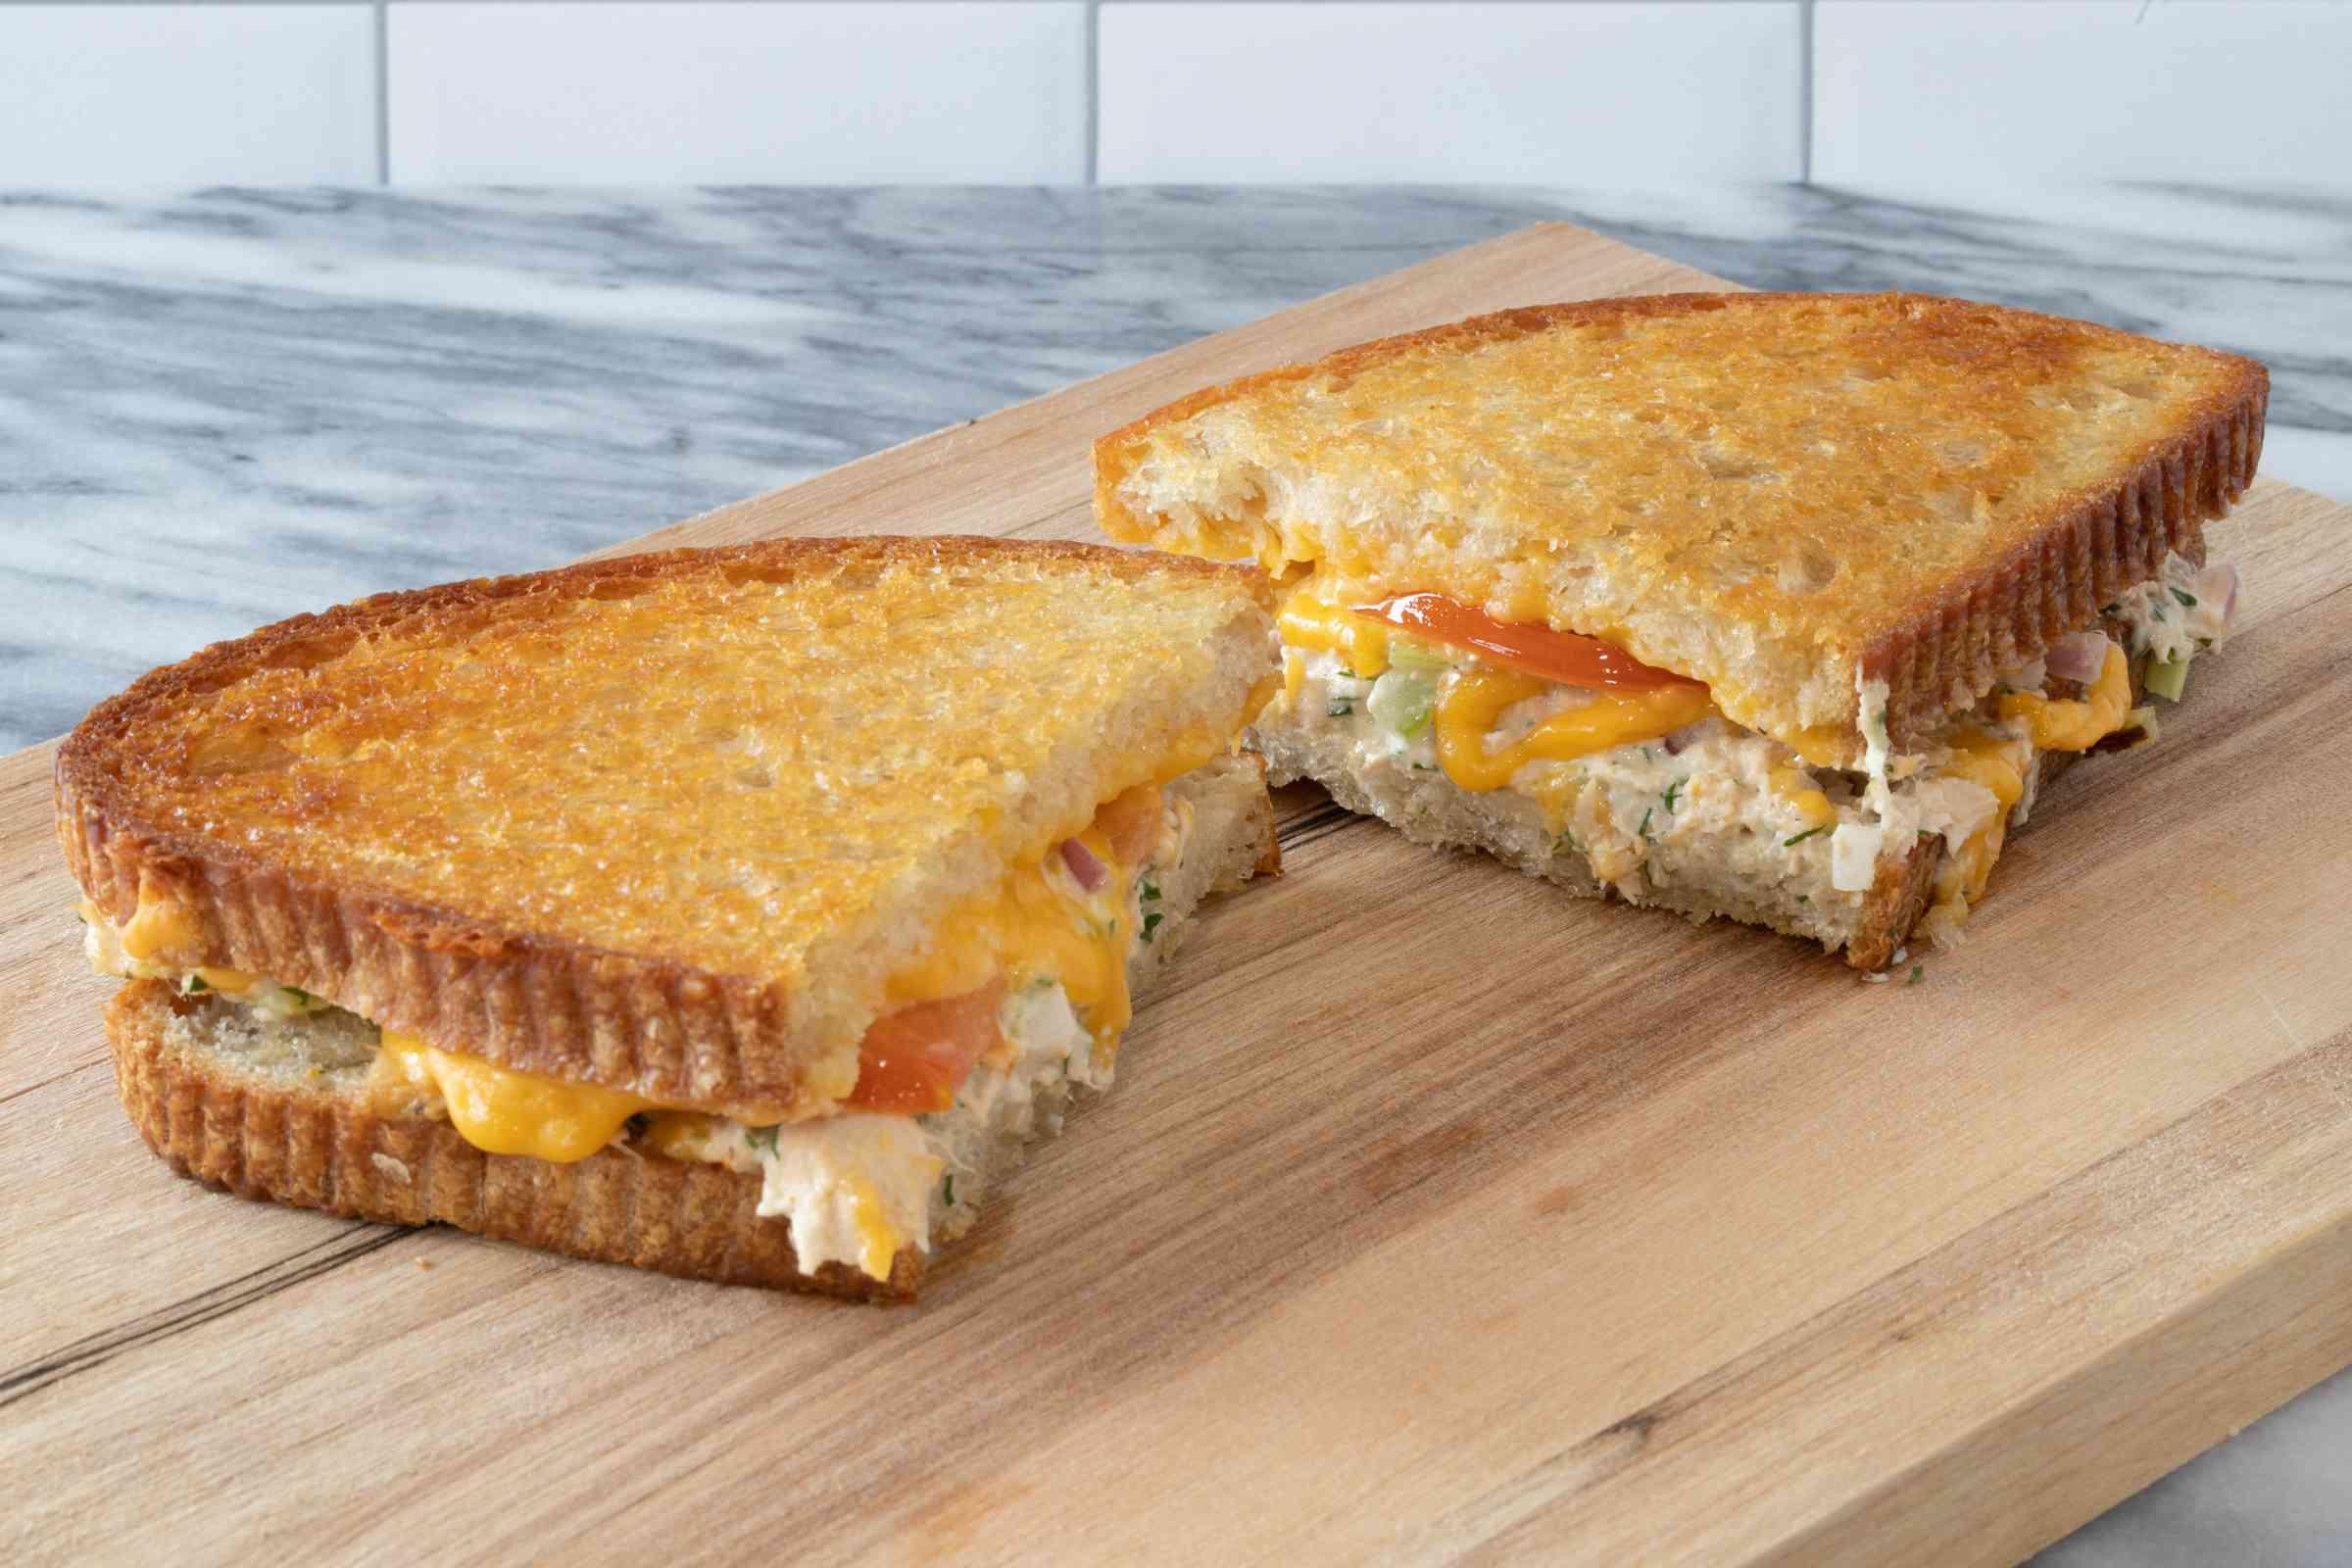 tuna melt sandwich on the cutting board